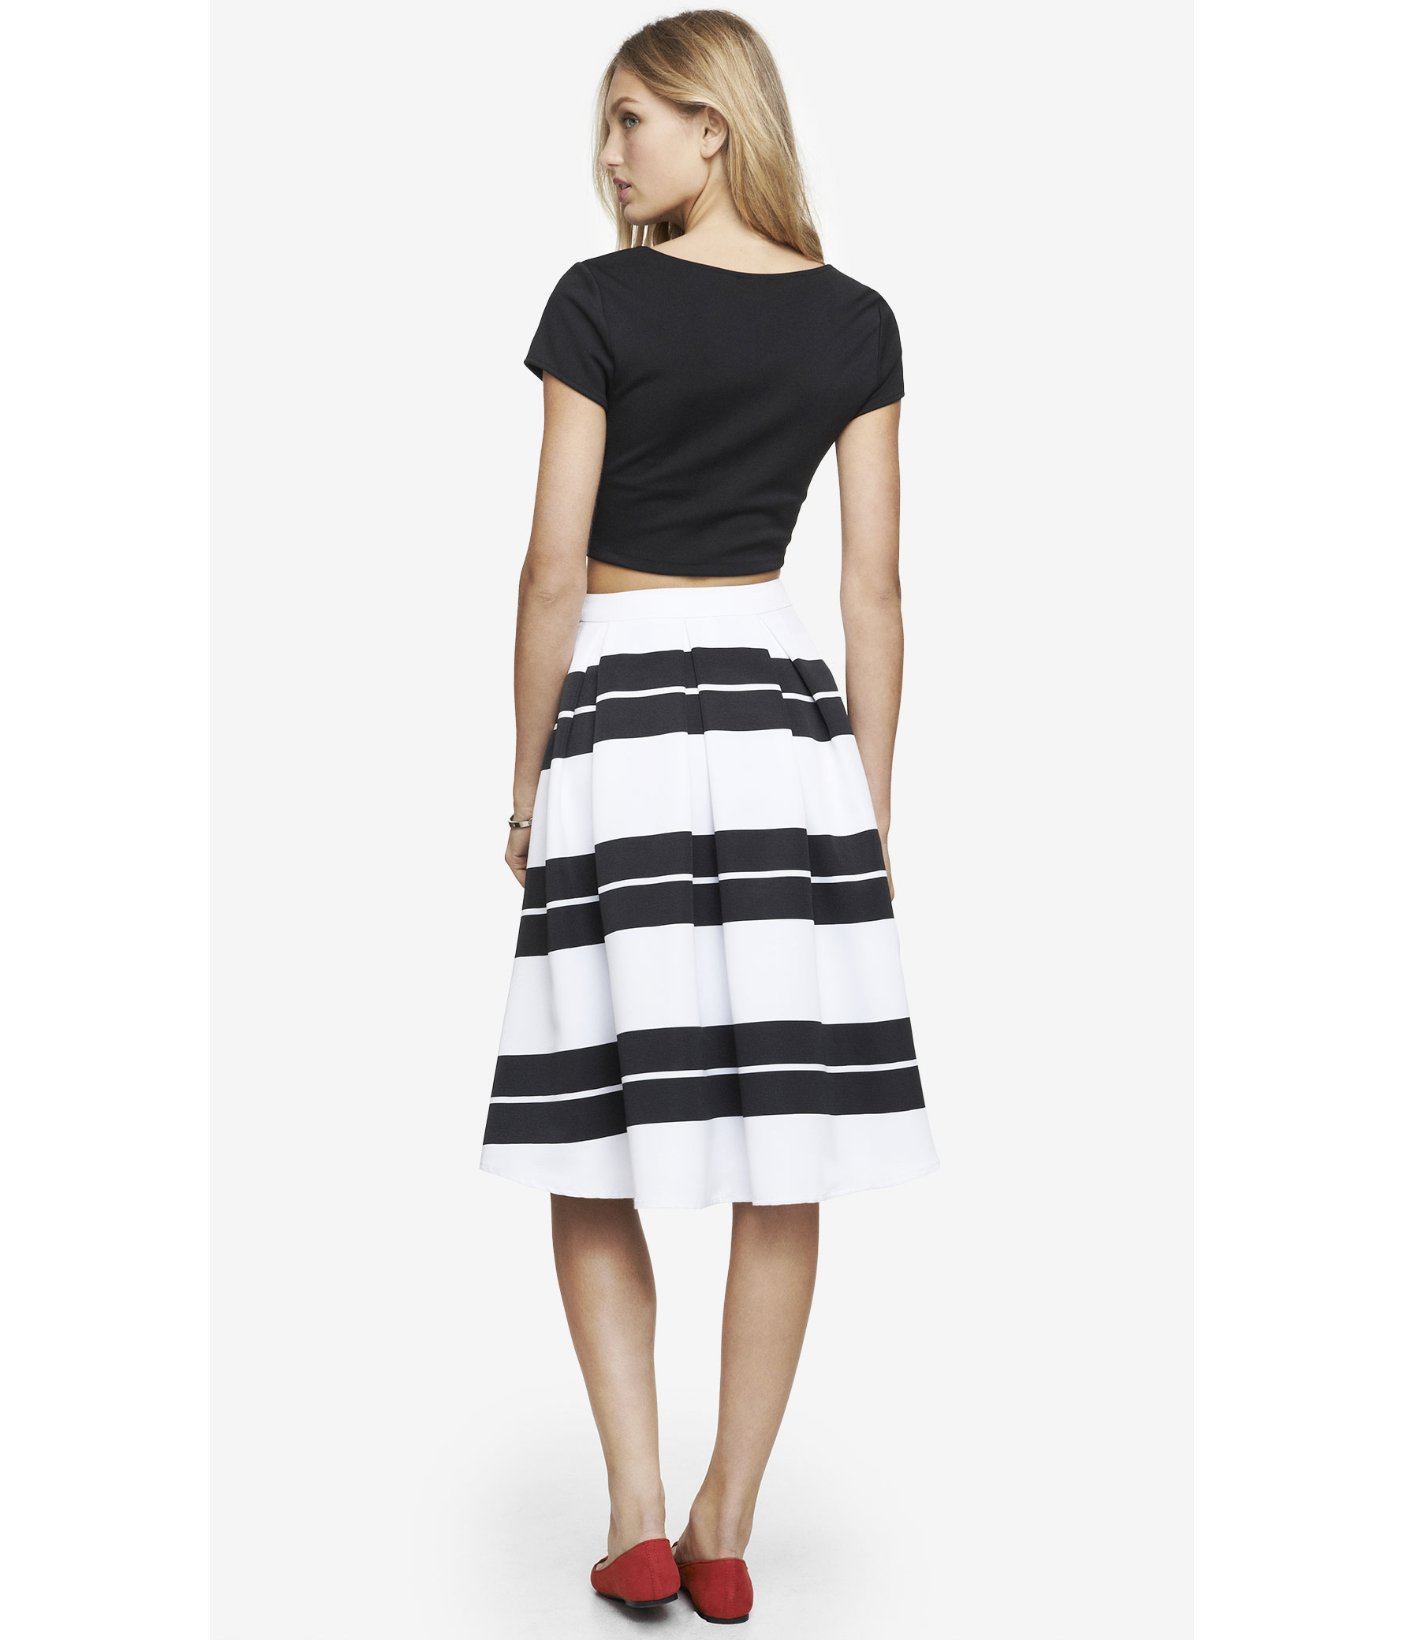 Express High Waist Striped Full Midi Skirt in Black | Lyst